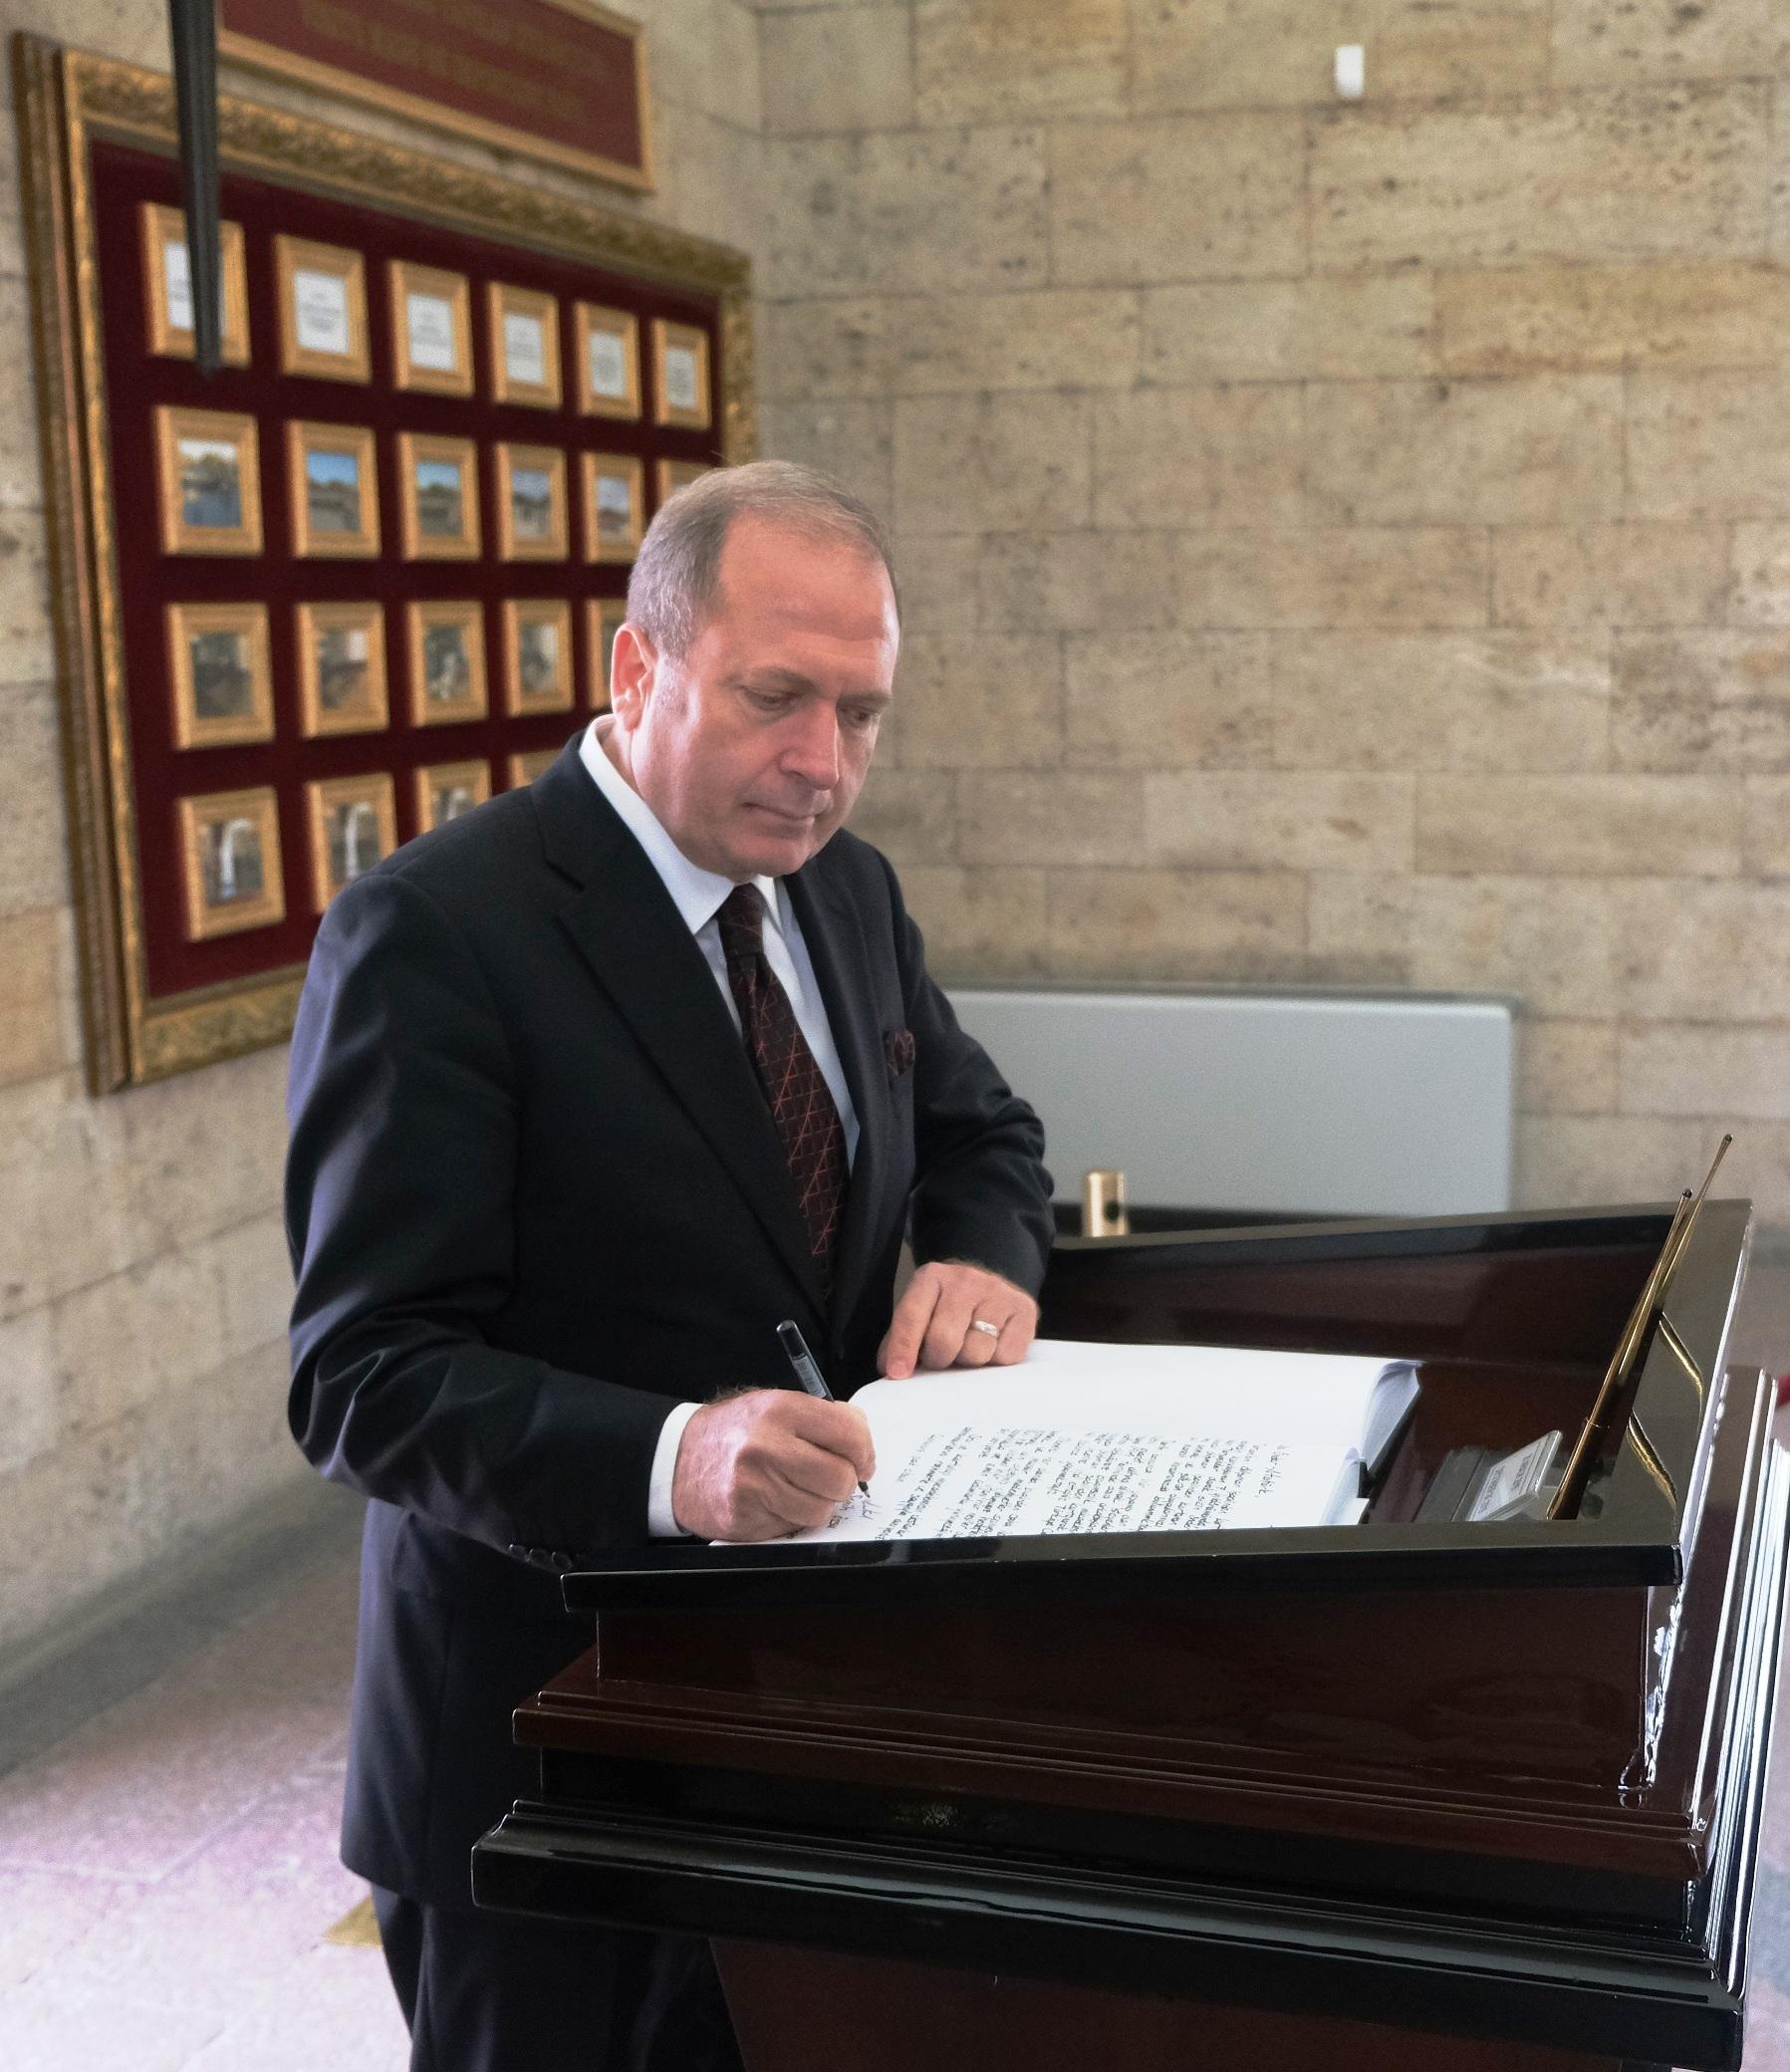 TADER Genel Başkanı Özsu'dan 30 Ağustos Zafer Bayramı Mesajı